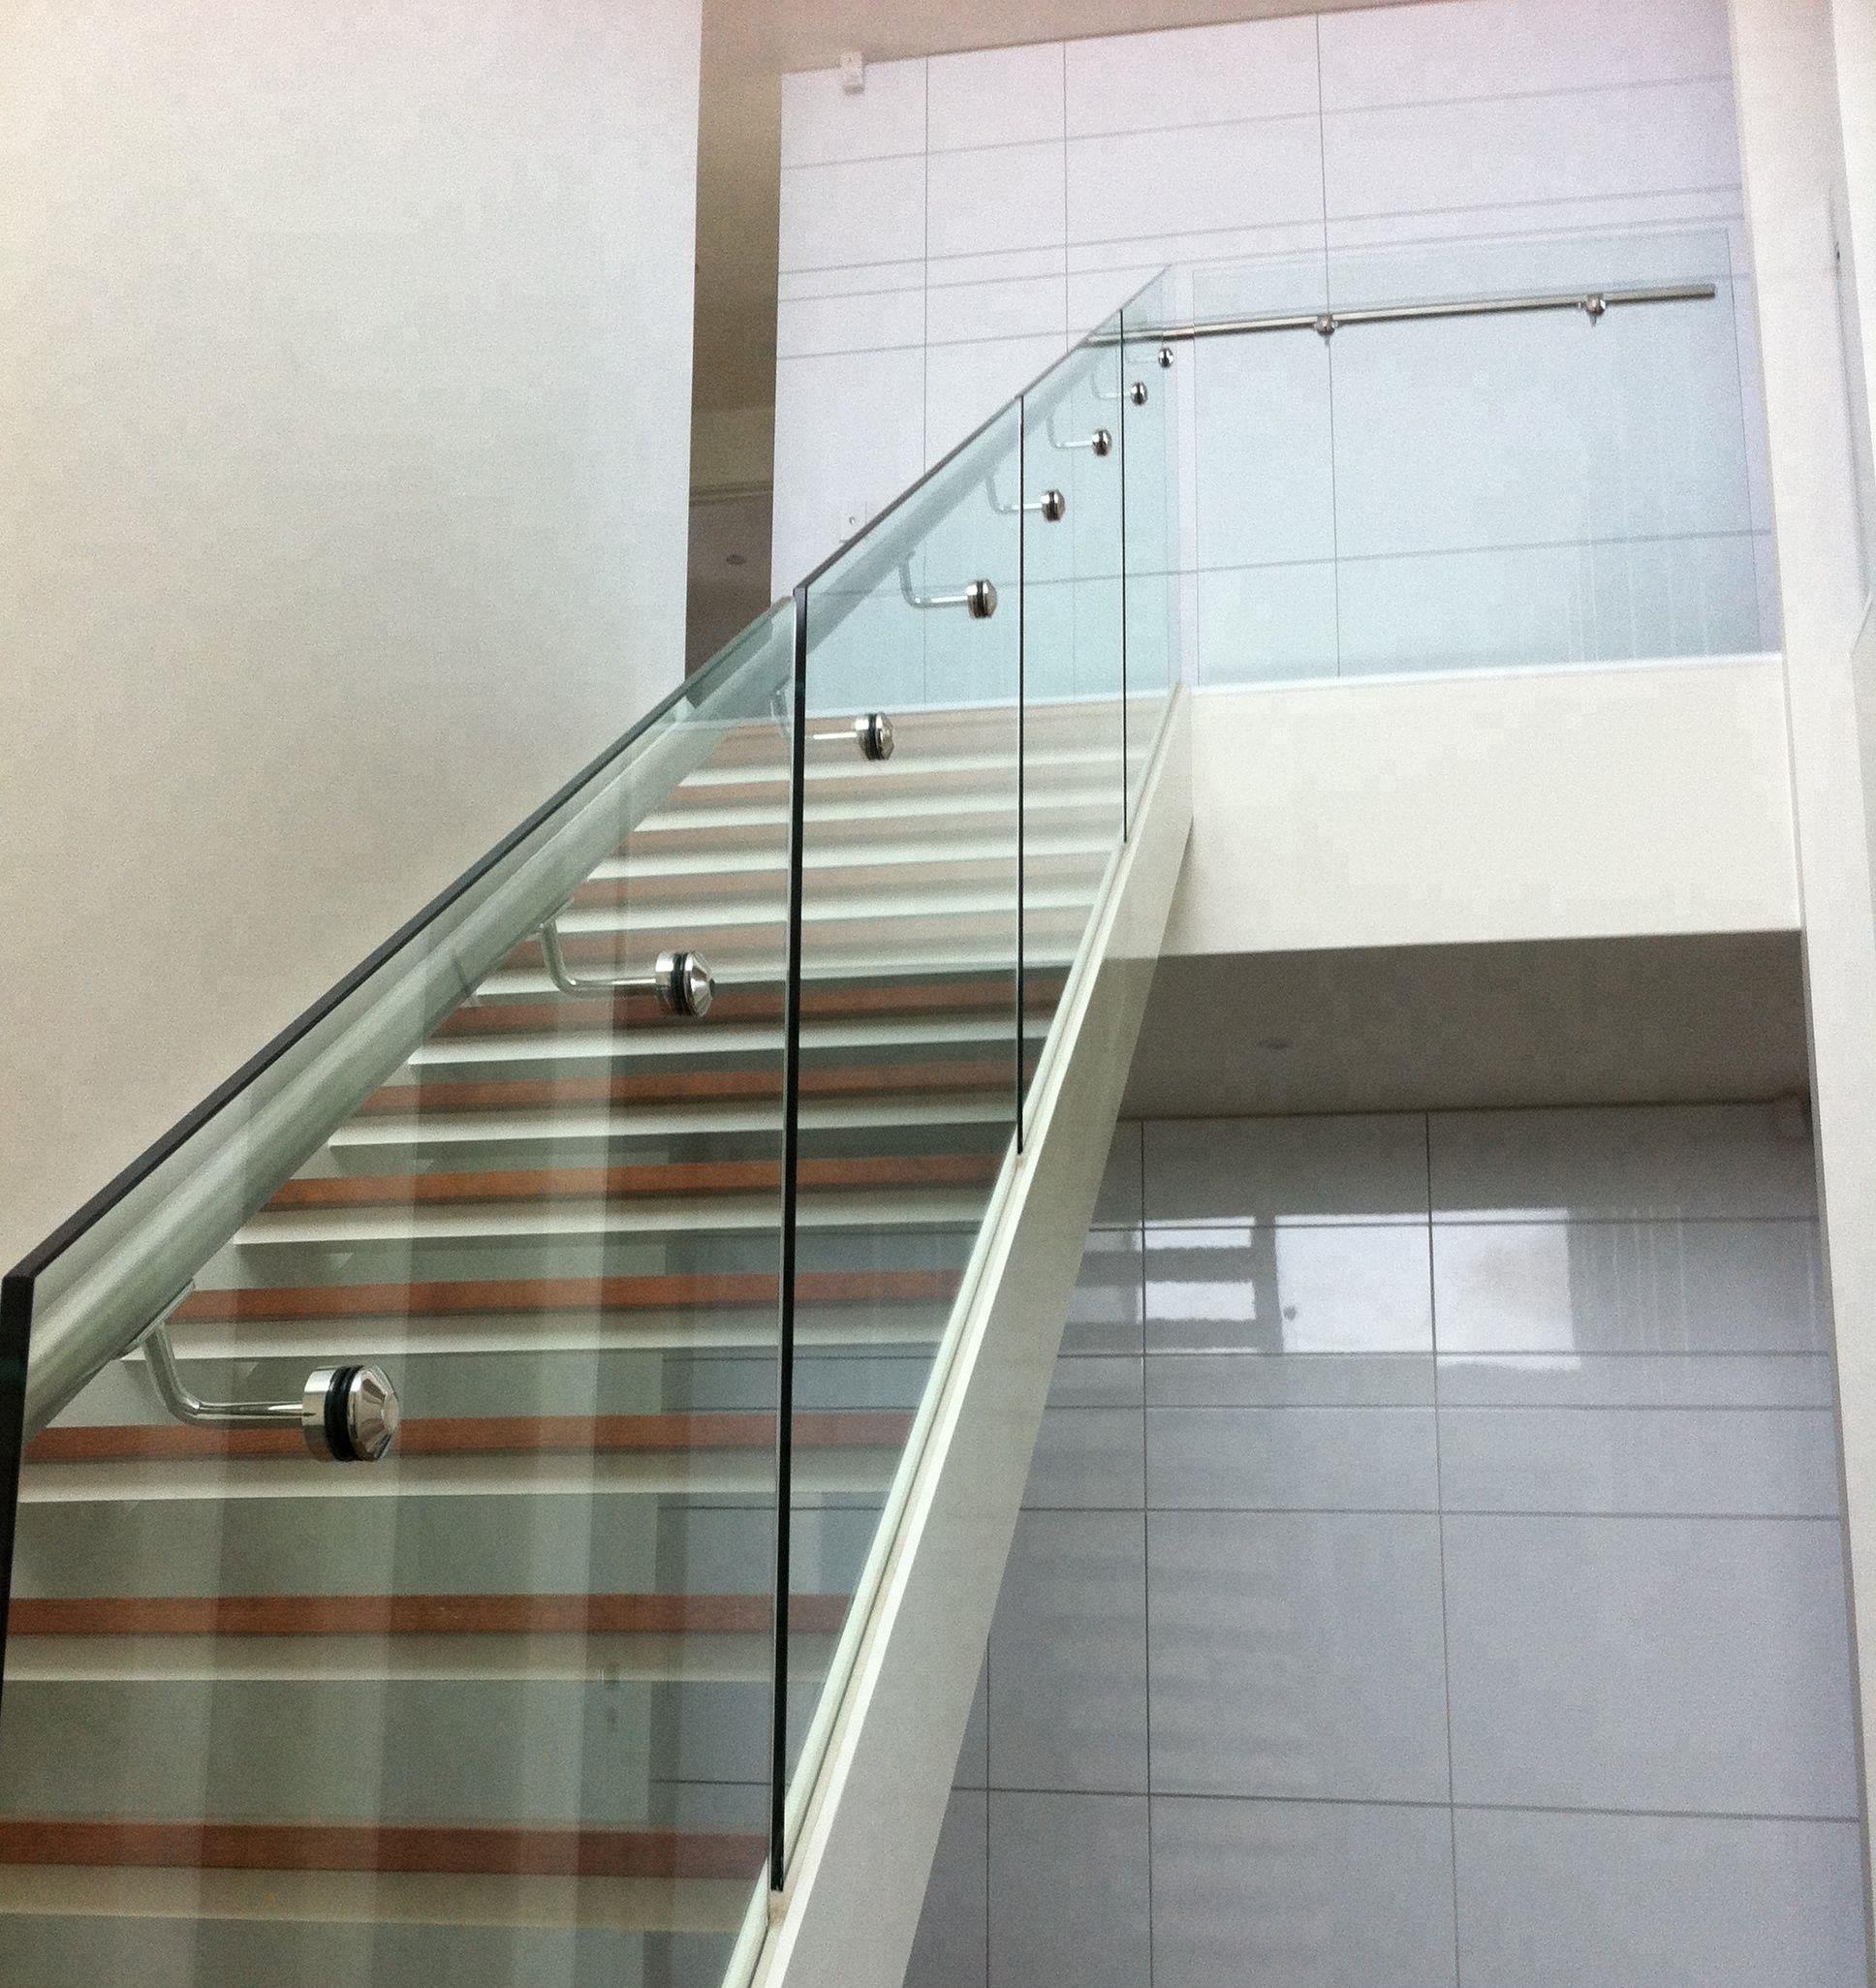 New Design Terrace Made In China Glass Railing Cost Per